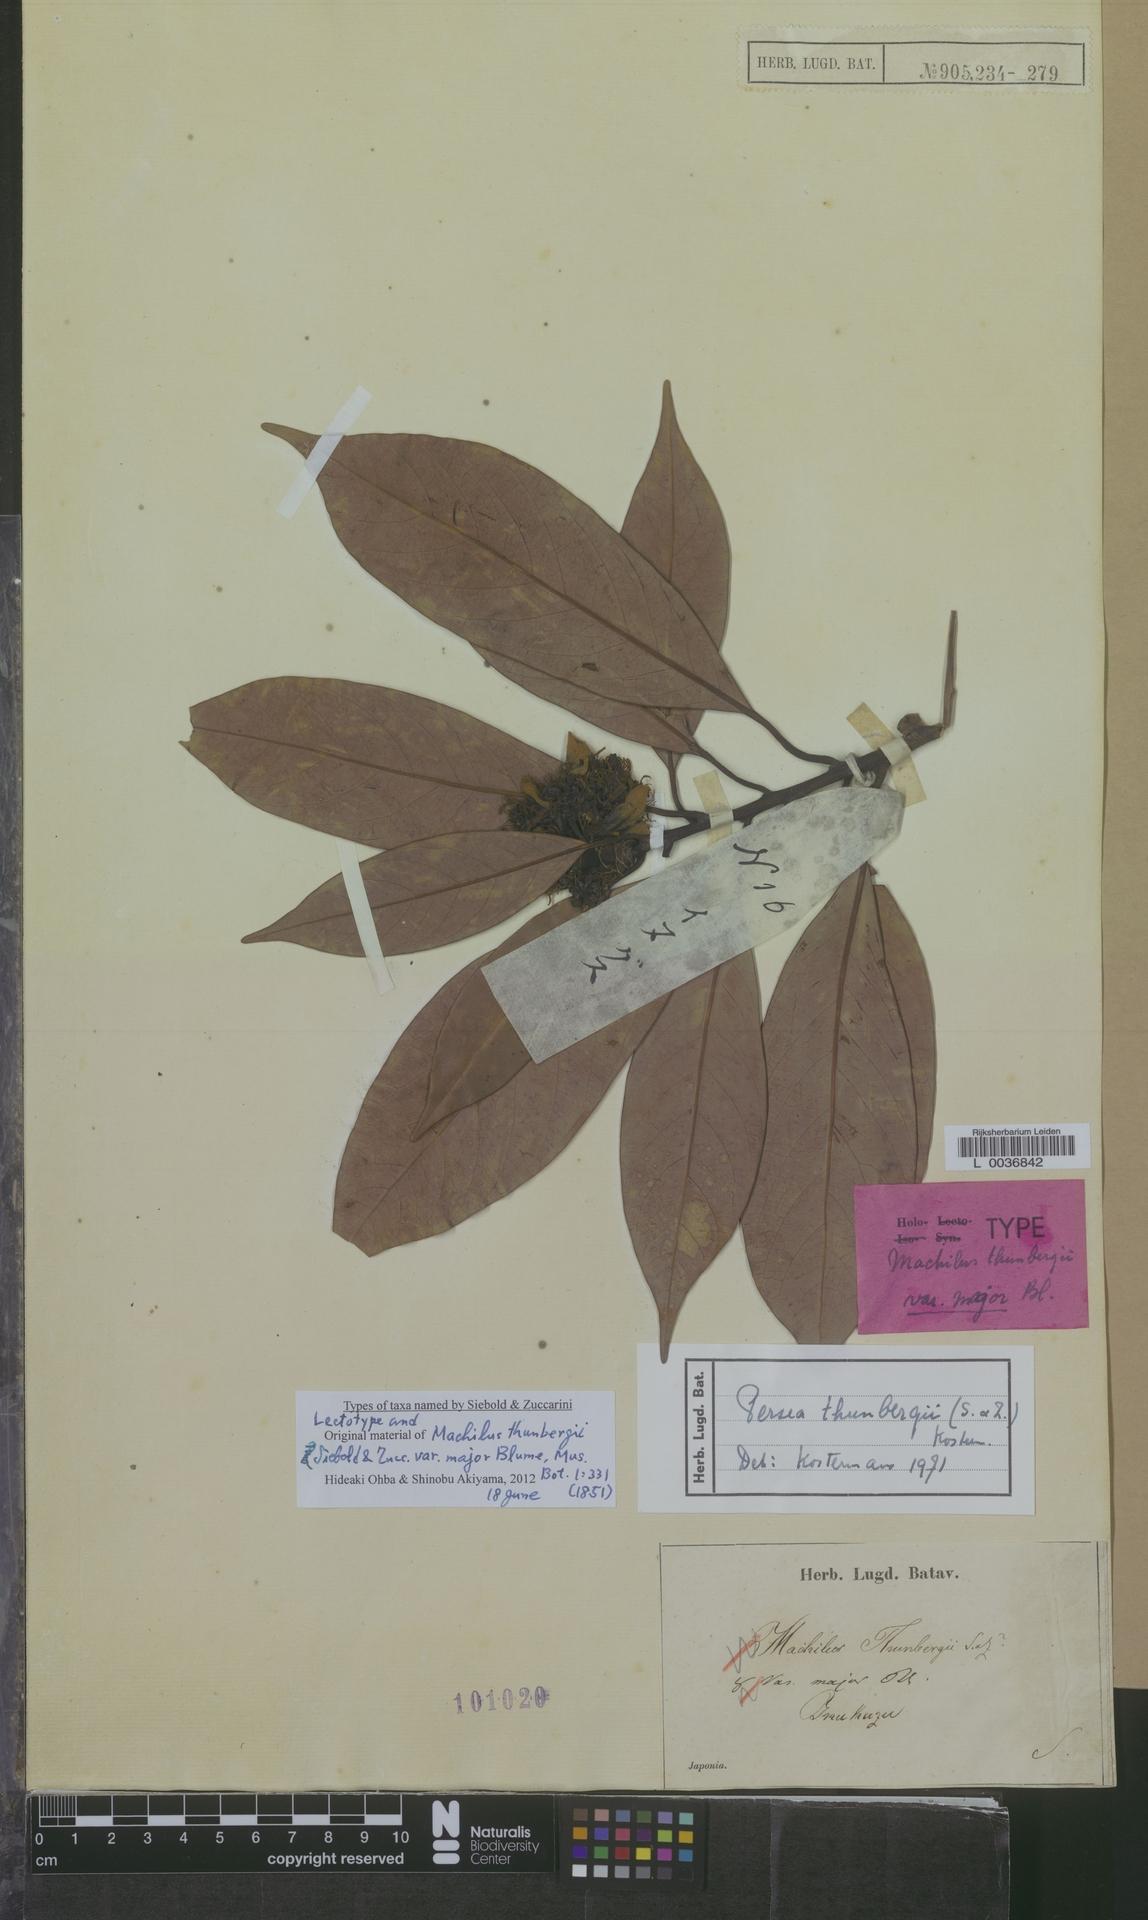 L  0036842   Persea thunbergii (Siebold & Zucc.) Kosterm.